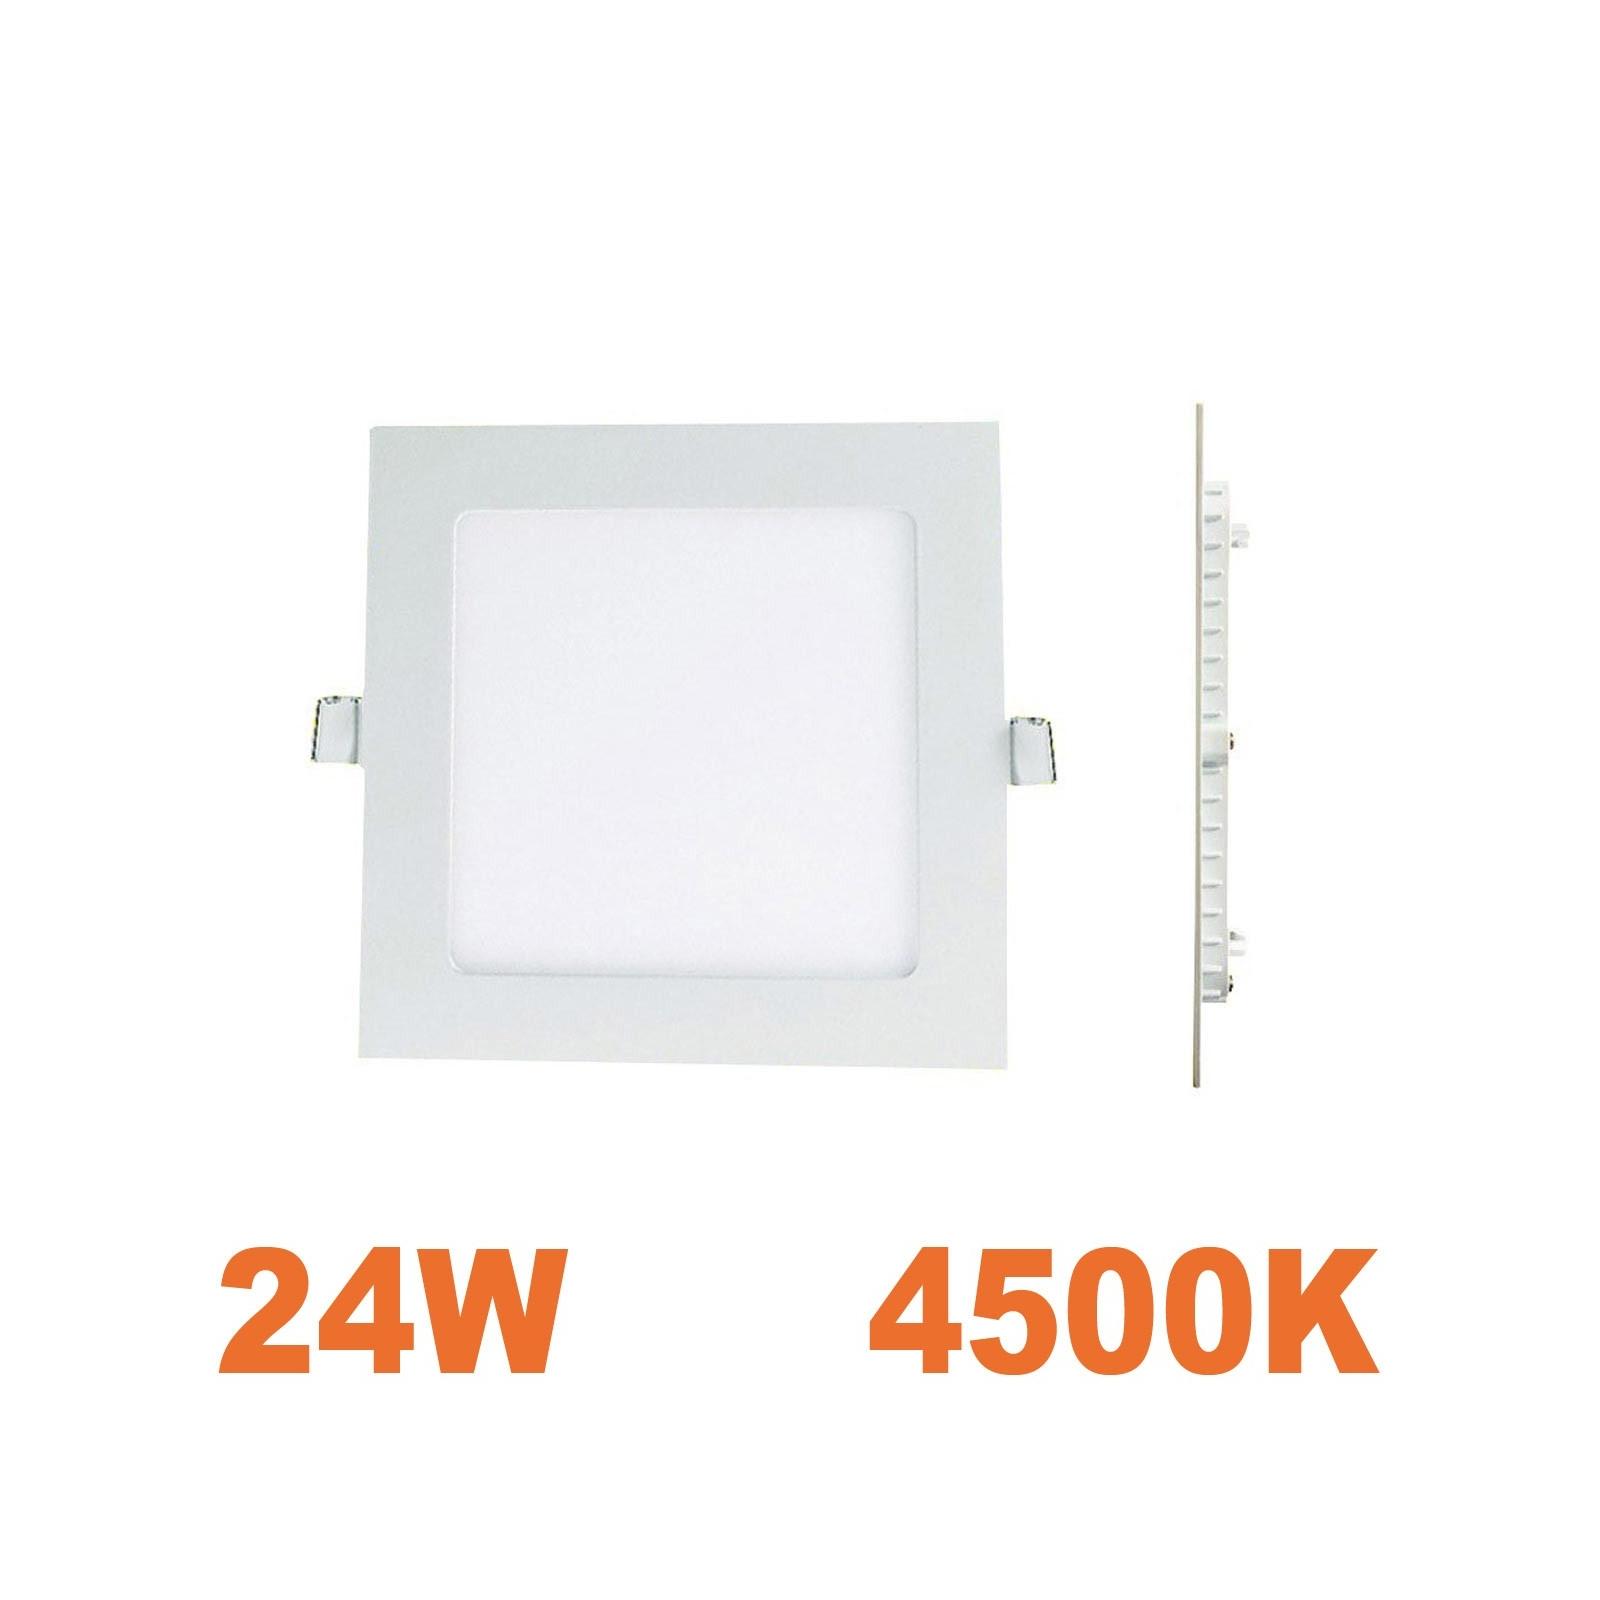 Spot Encastrable LED Carre Downlight Panel Extra-Plat 25W Blanc Neutre 4500k